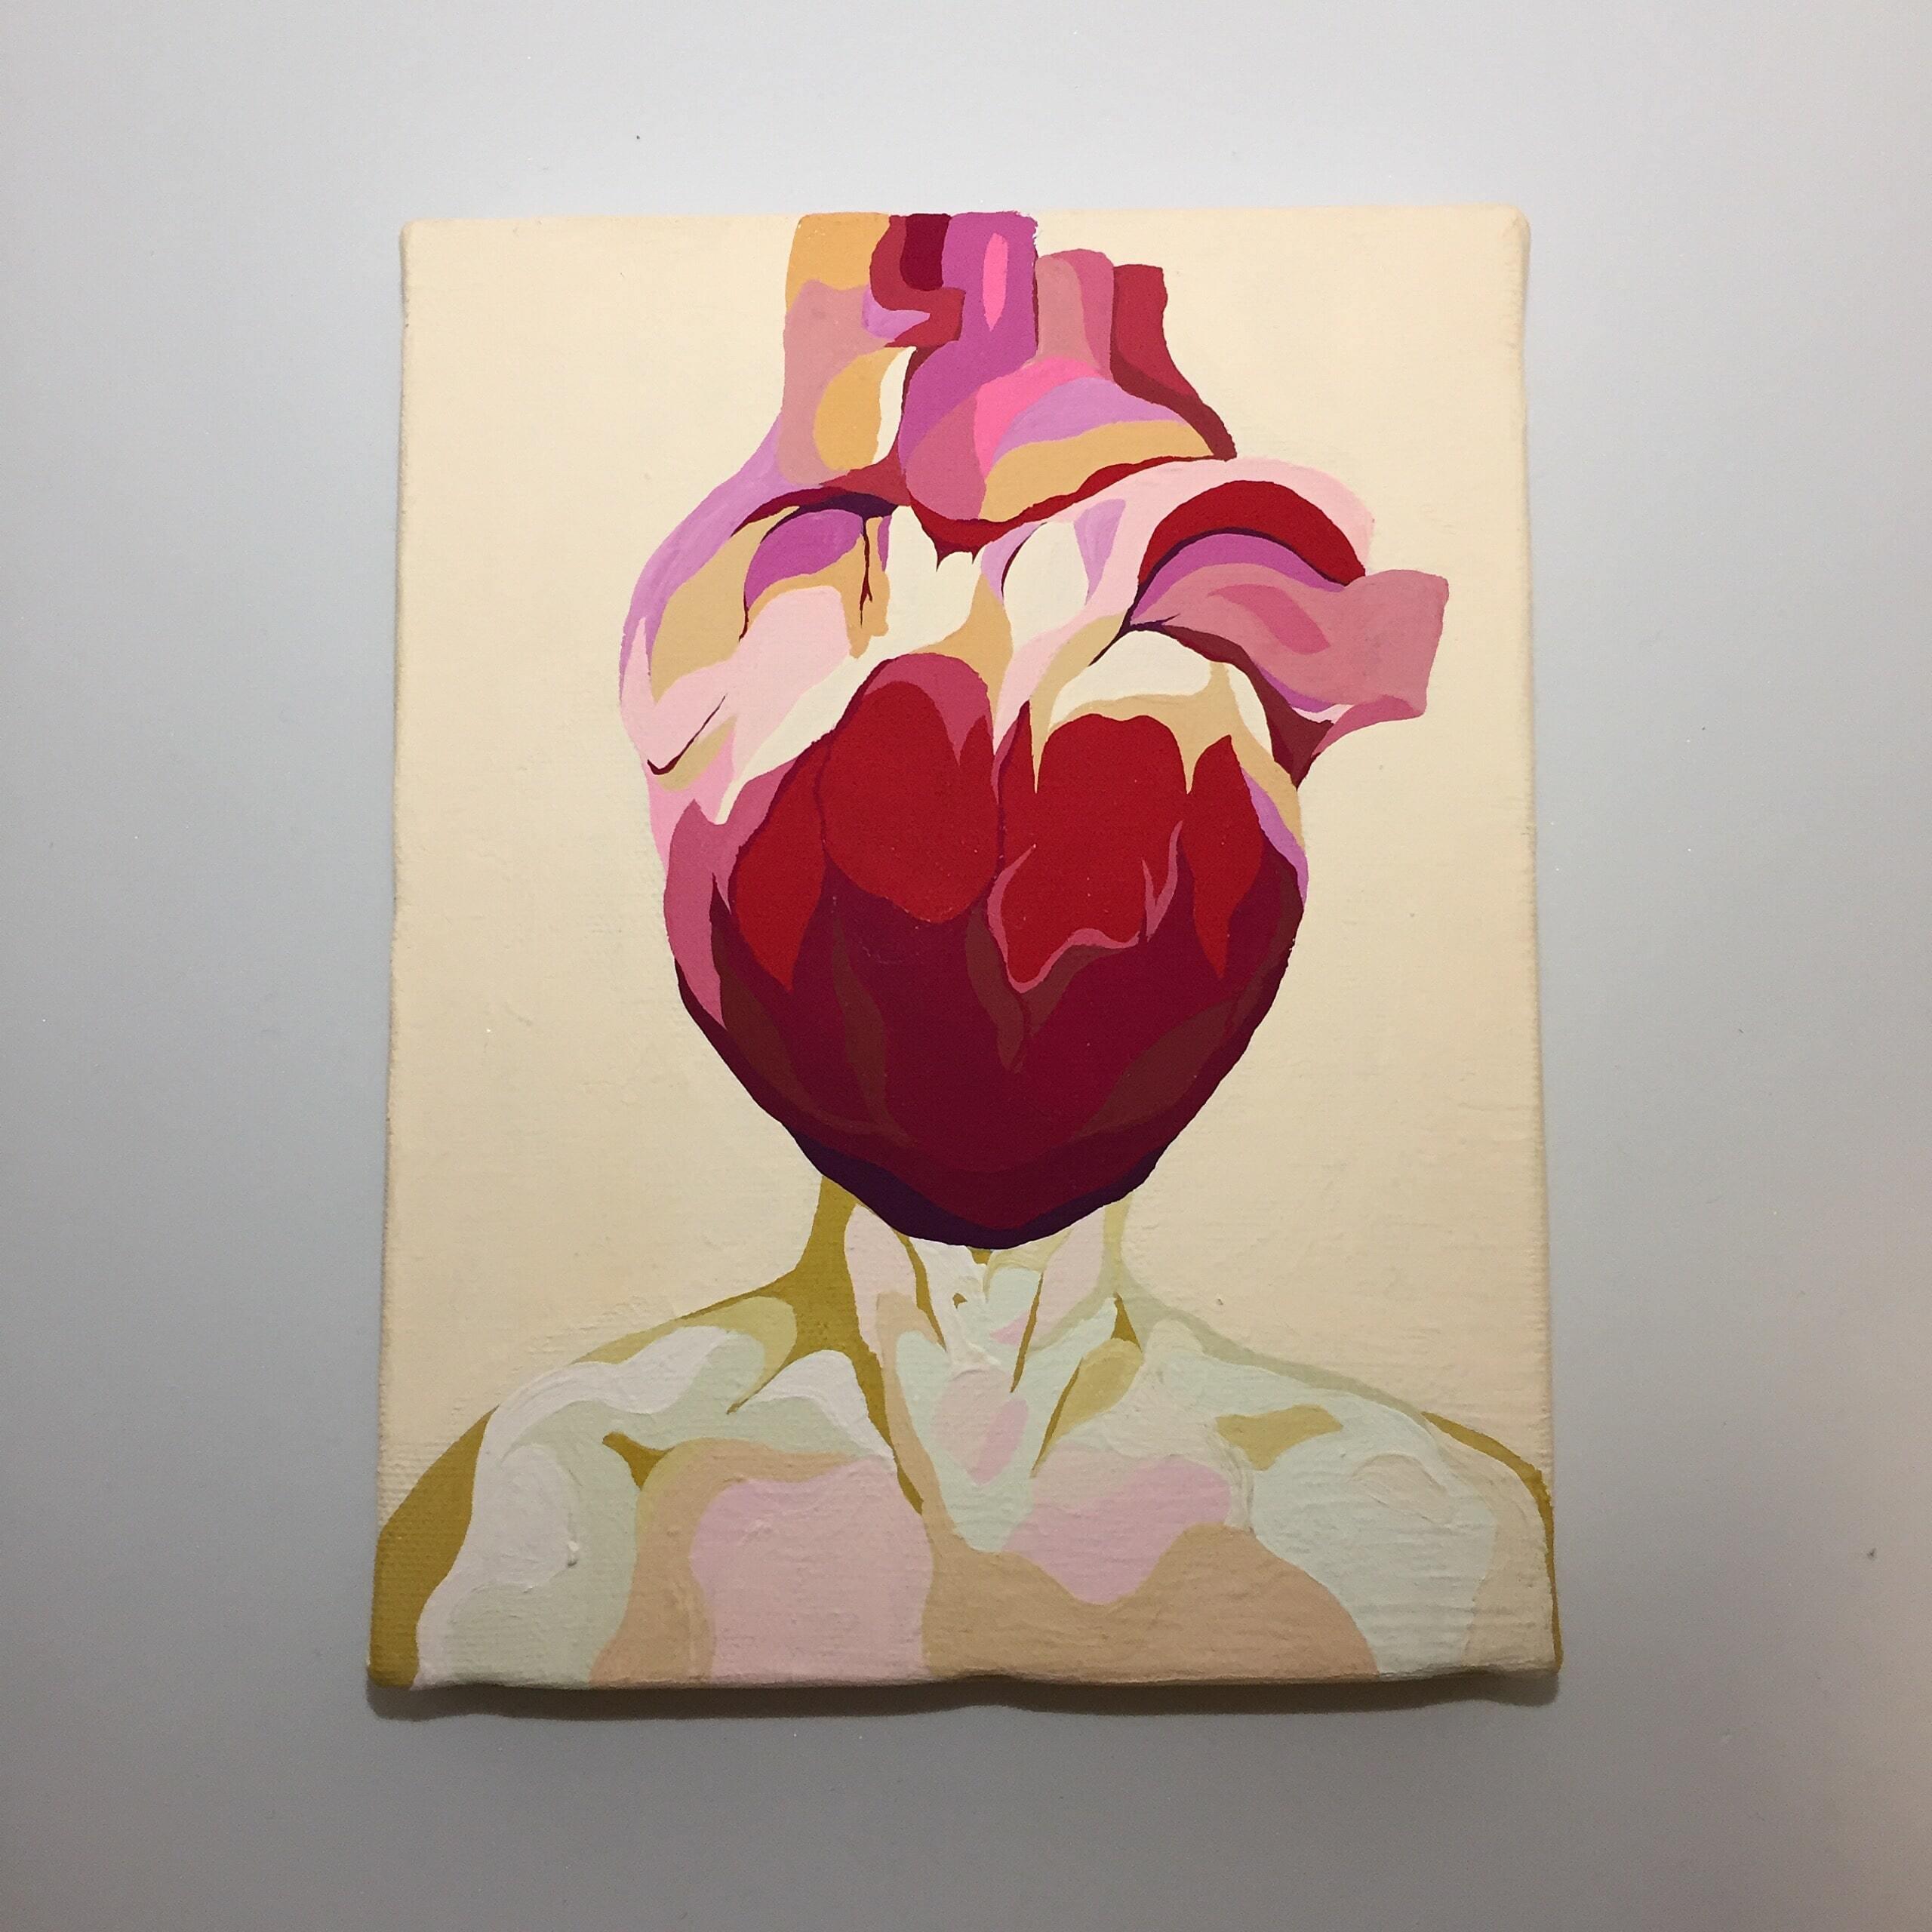 HEART HUMAN NUDE #2(2019) / 18cm×14cm / Acrylic painting / Original Drawing